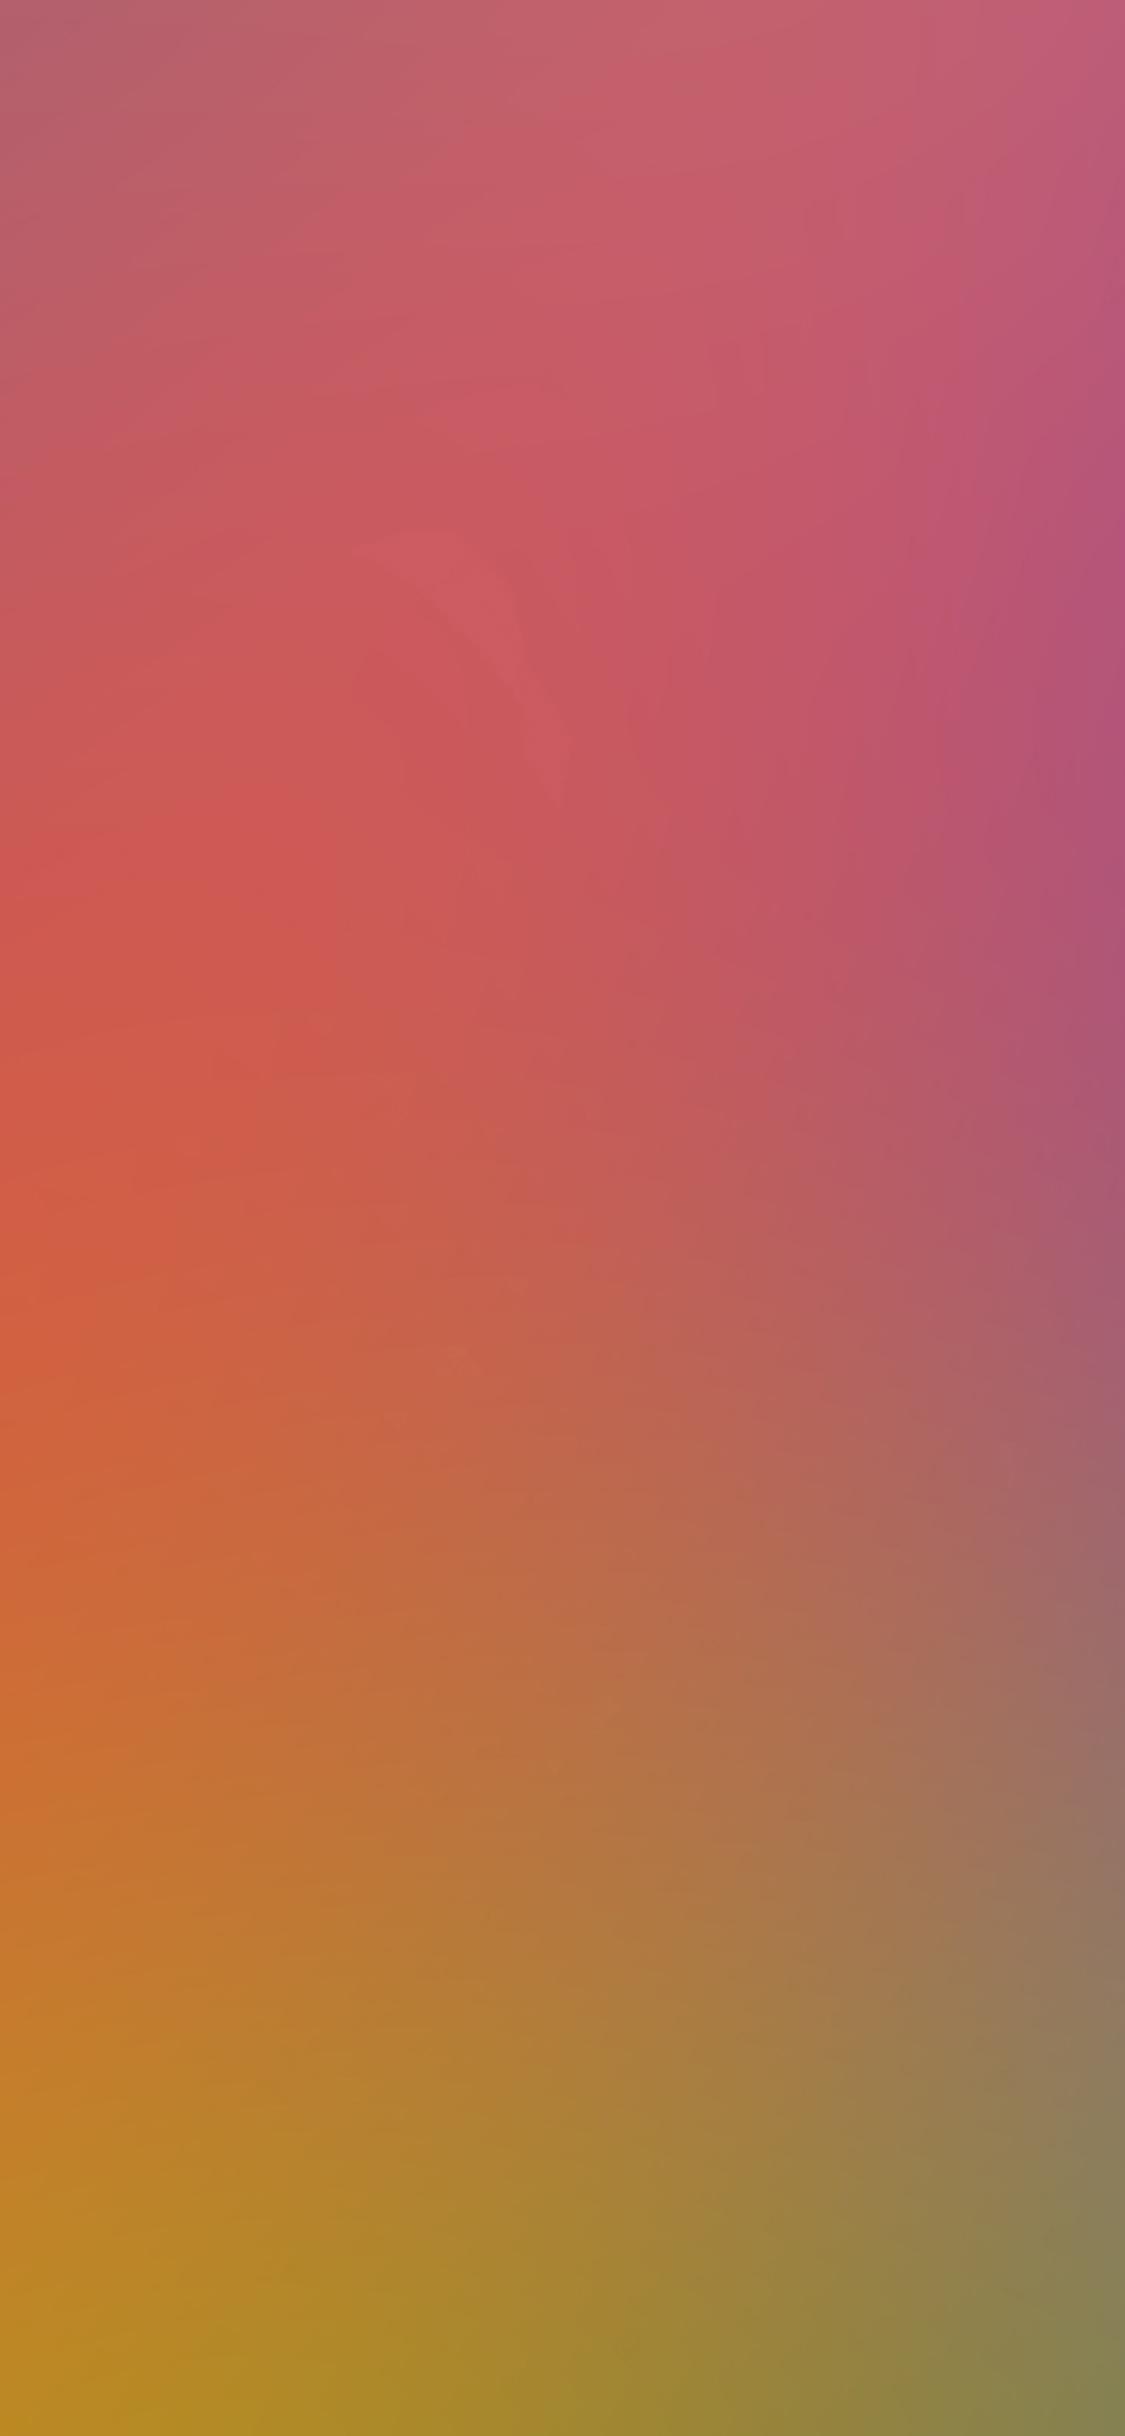 iPhoneXpapers.com-Apple-iPhone-wallpaper-sc45-alien-cucumber-melon-blur